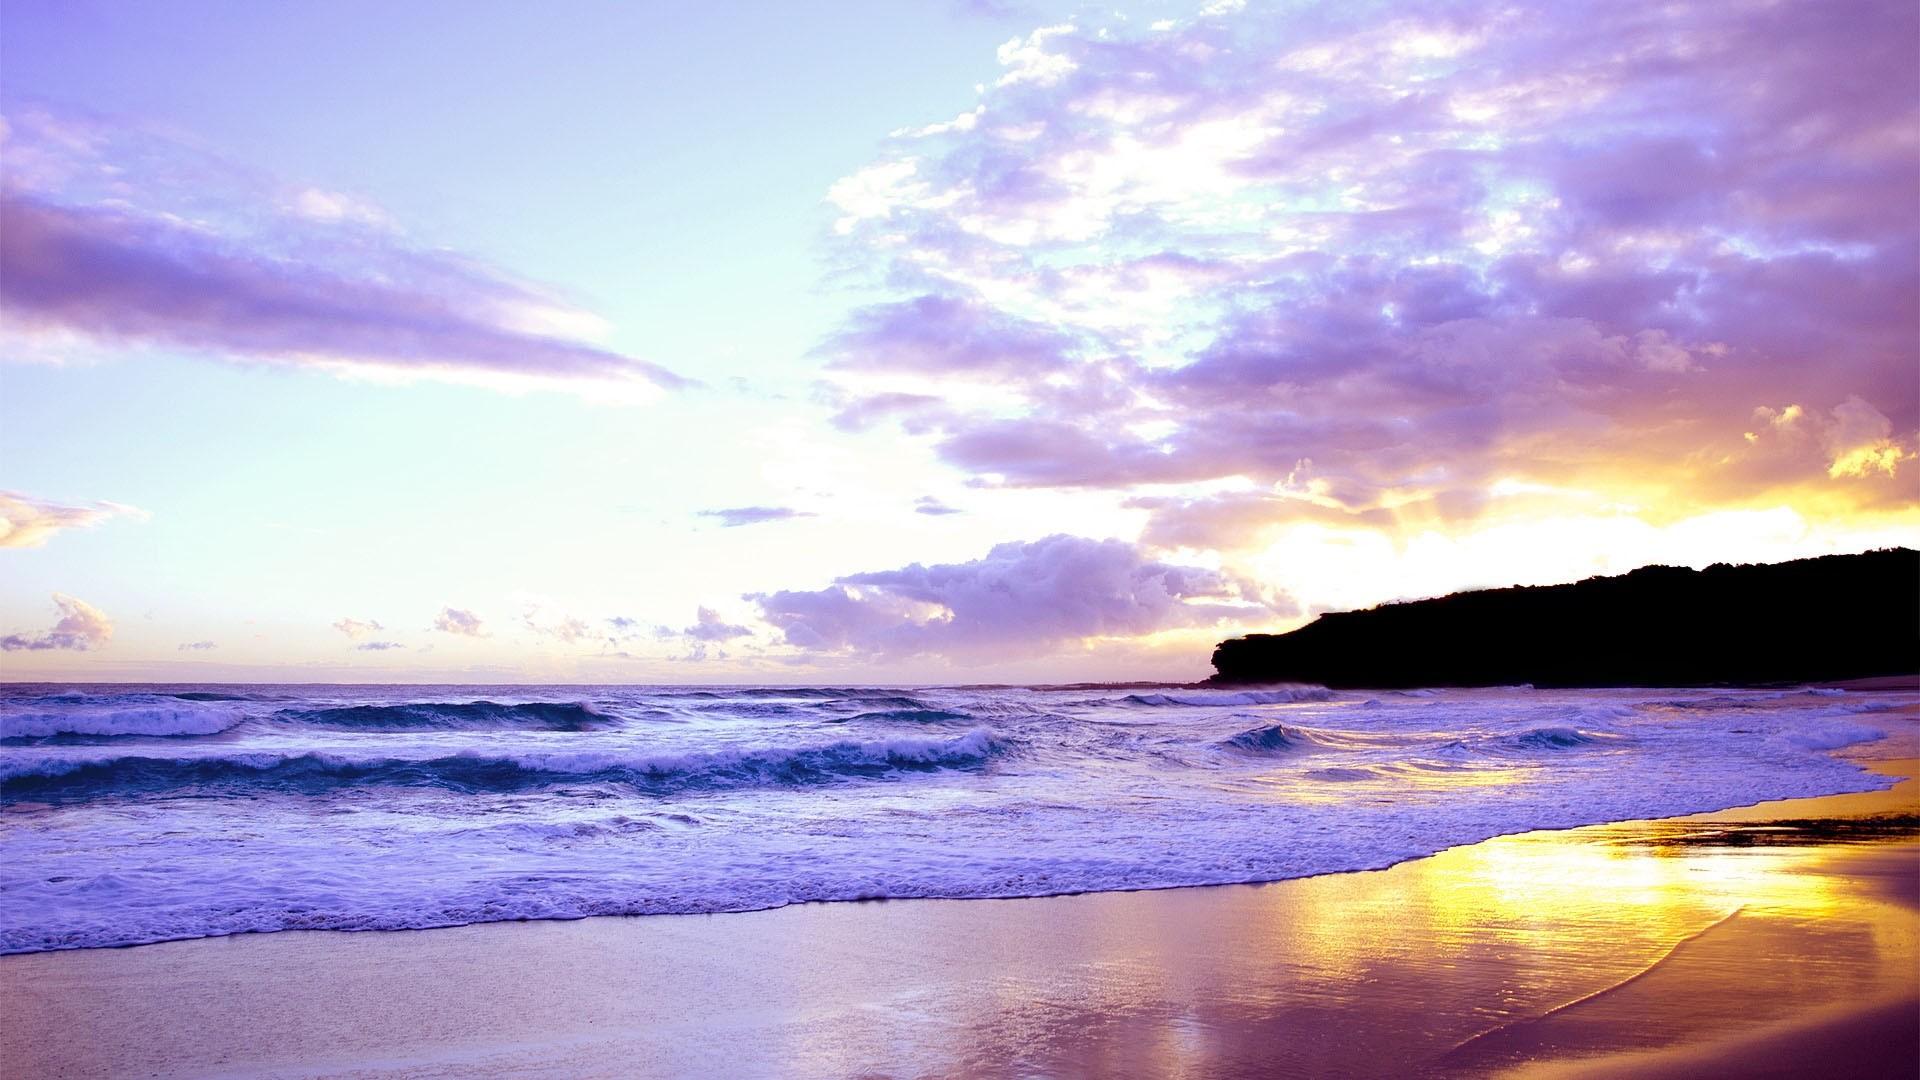 Panoramic Beach Wallpapers High Resolution